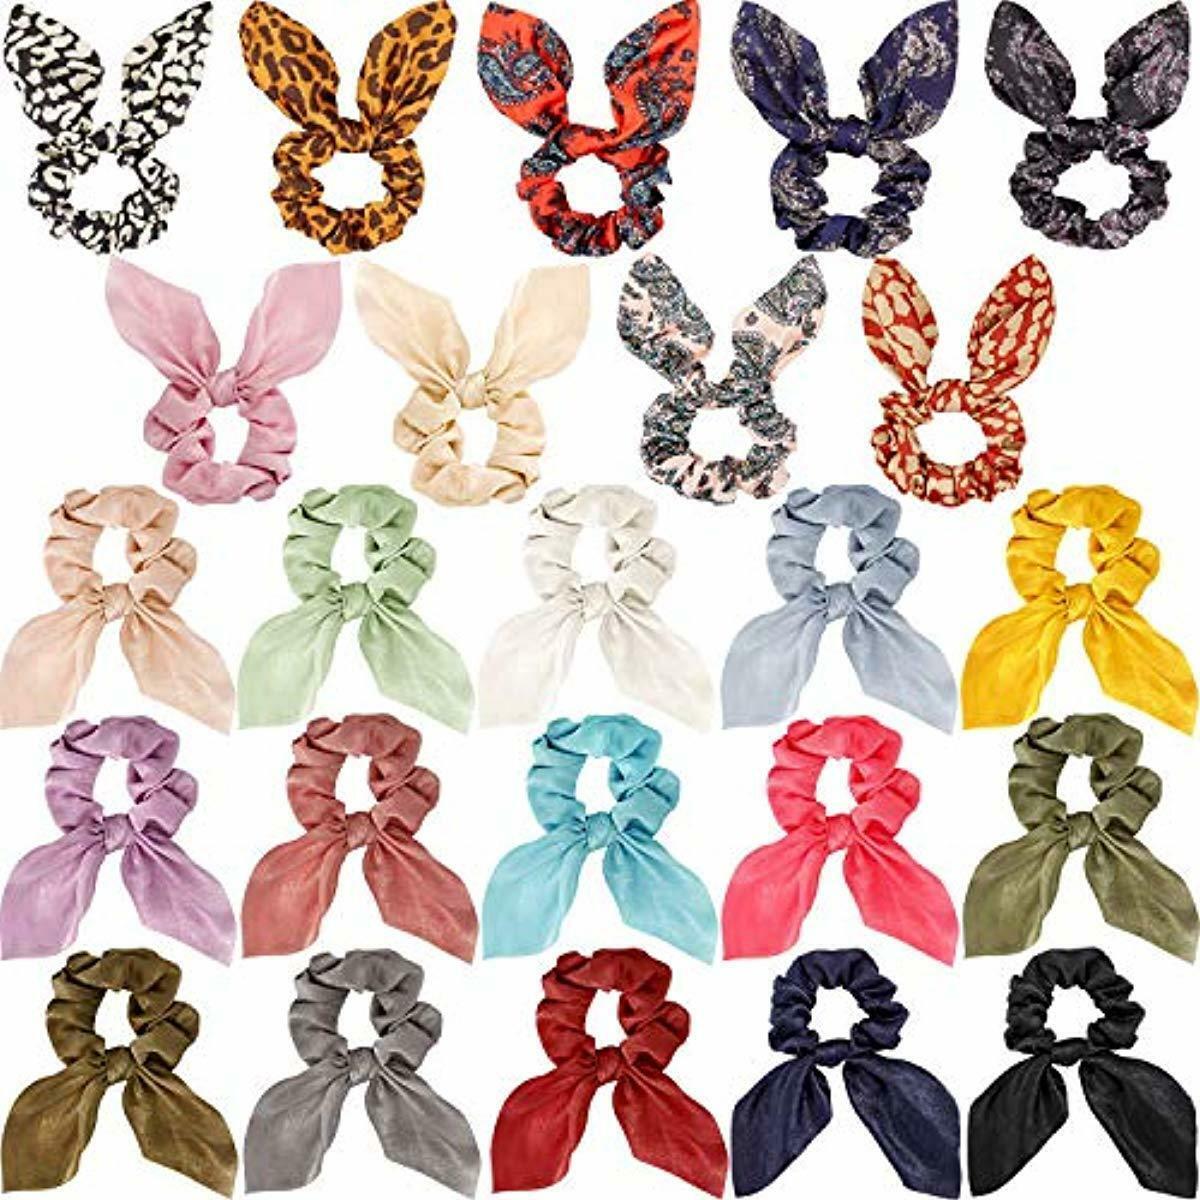 24 Pieces Hair Scrunchies Soft Scarves Scrunchies Elastic Ha